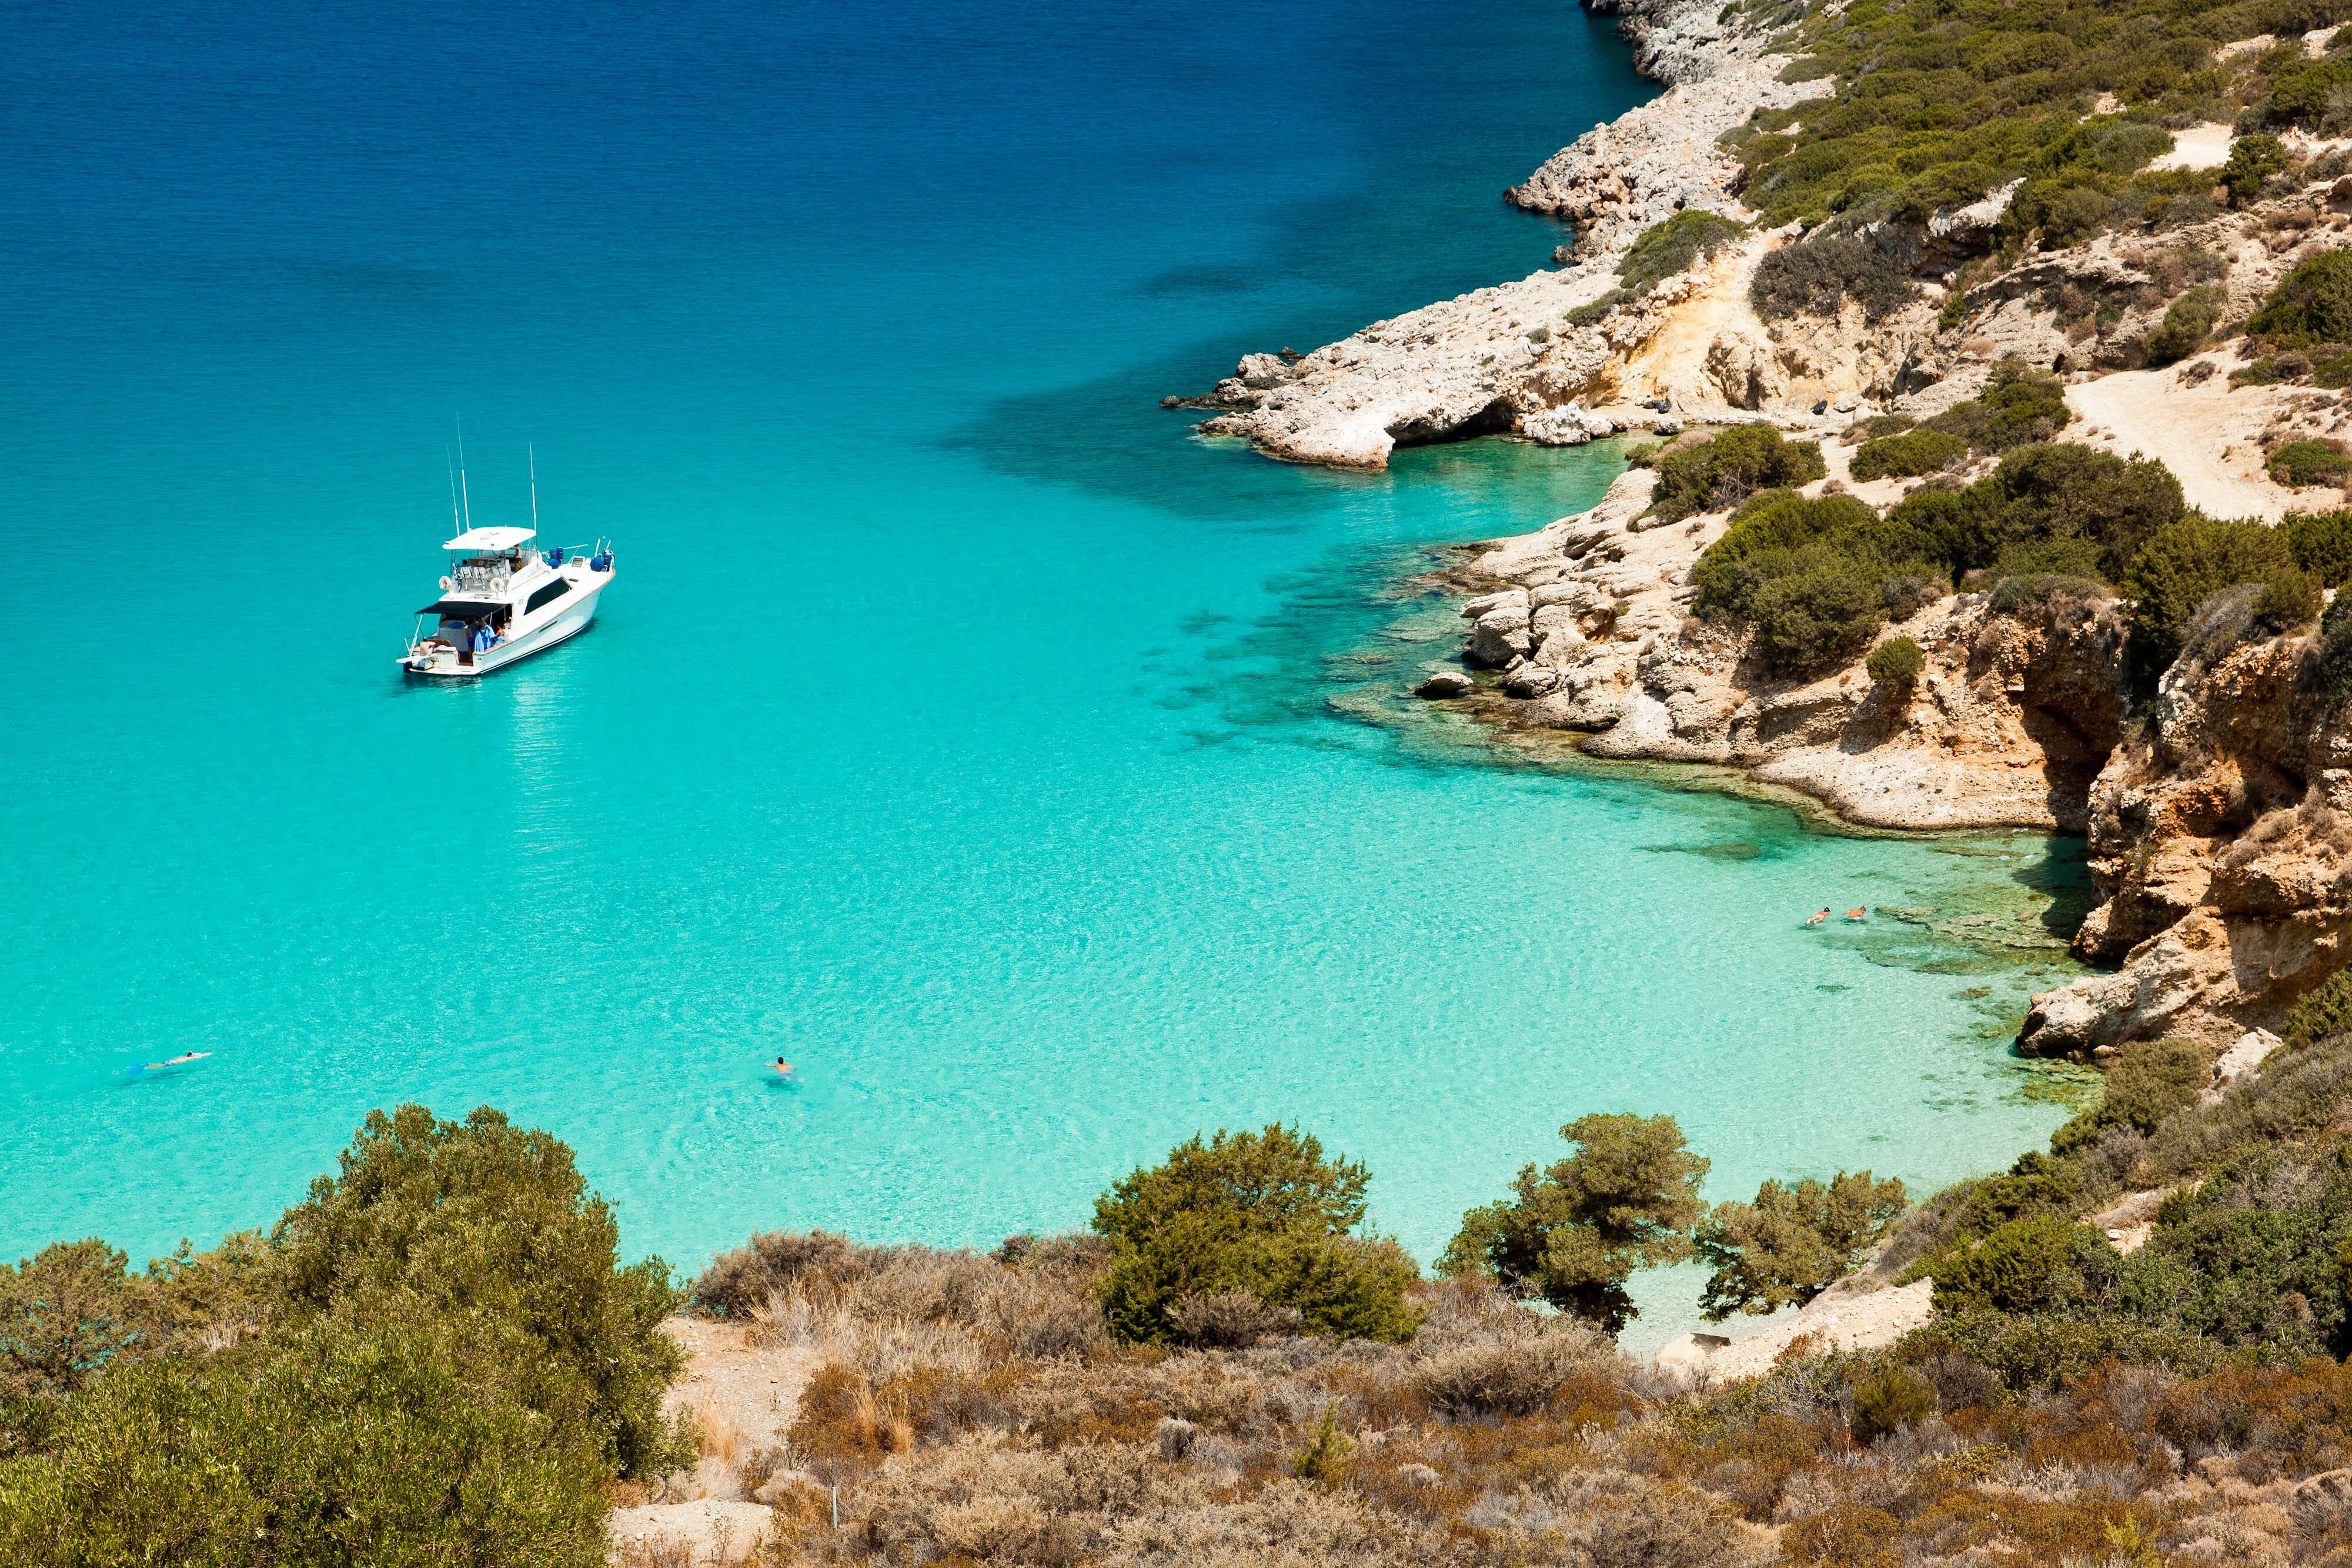 Top atractii turistice intr-o vacanta in Creta 2020